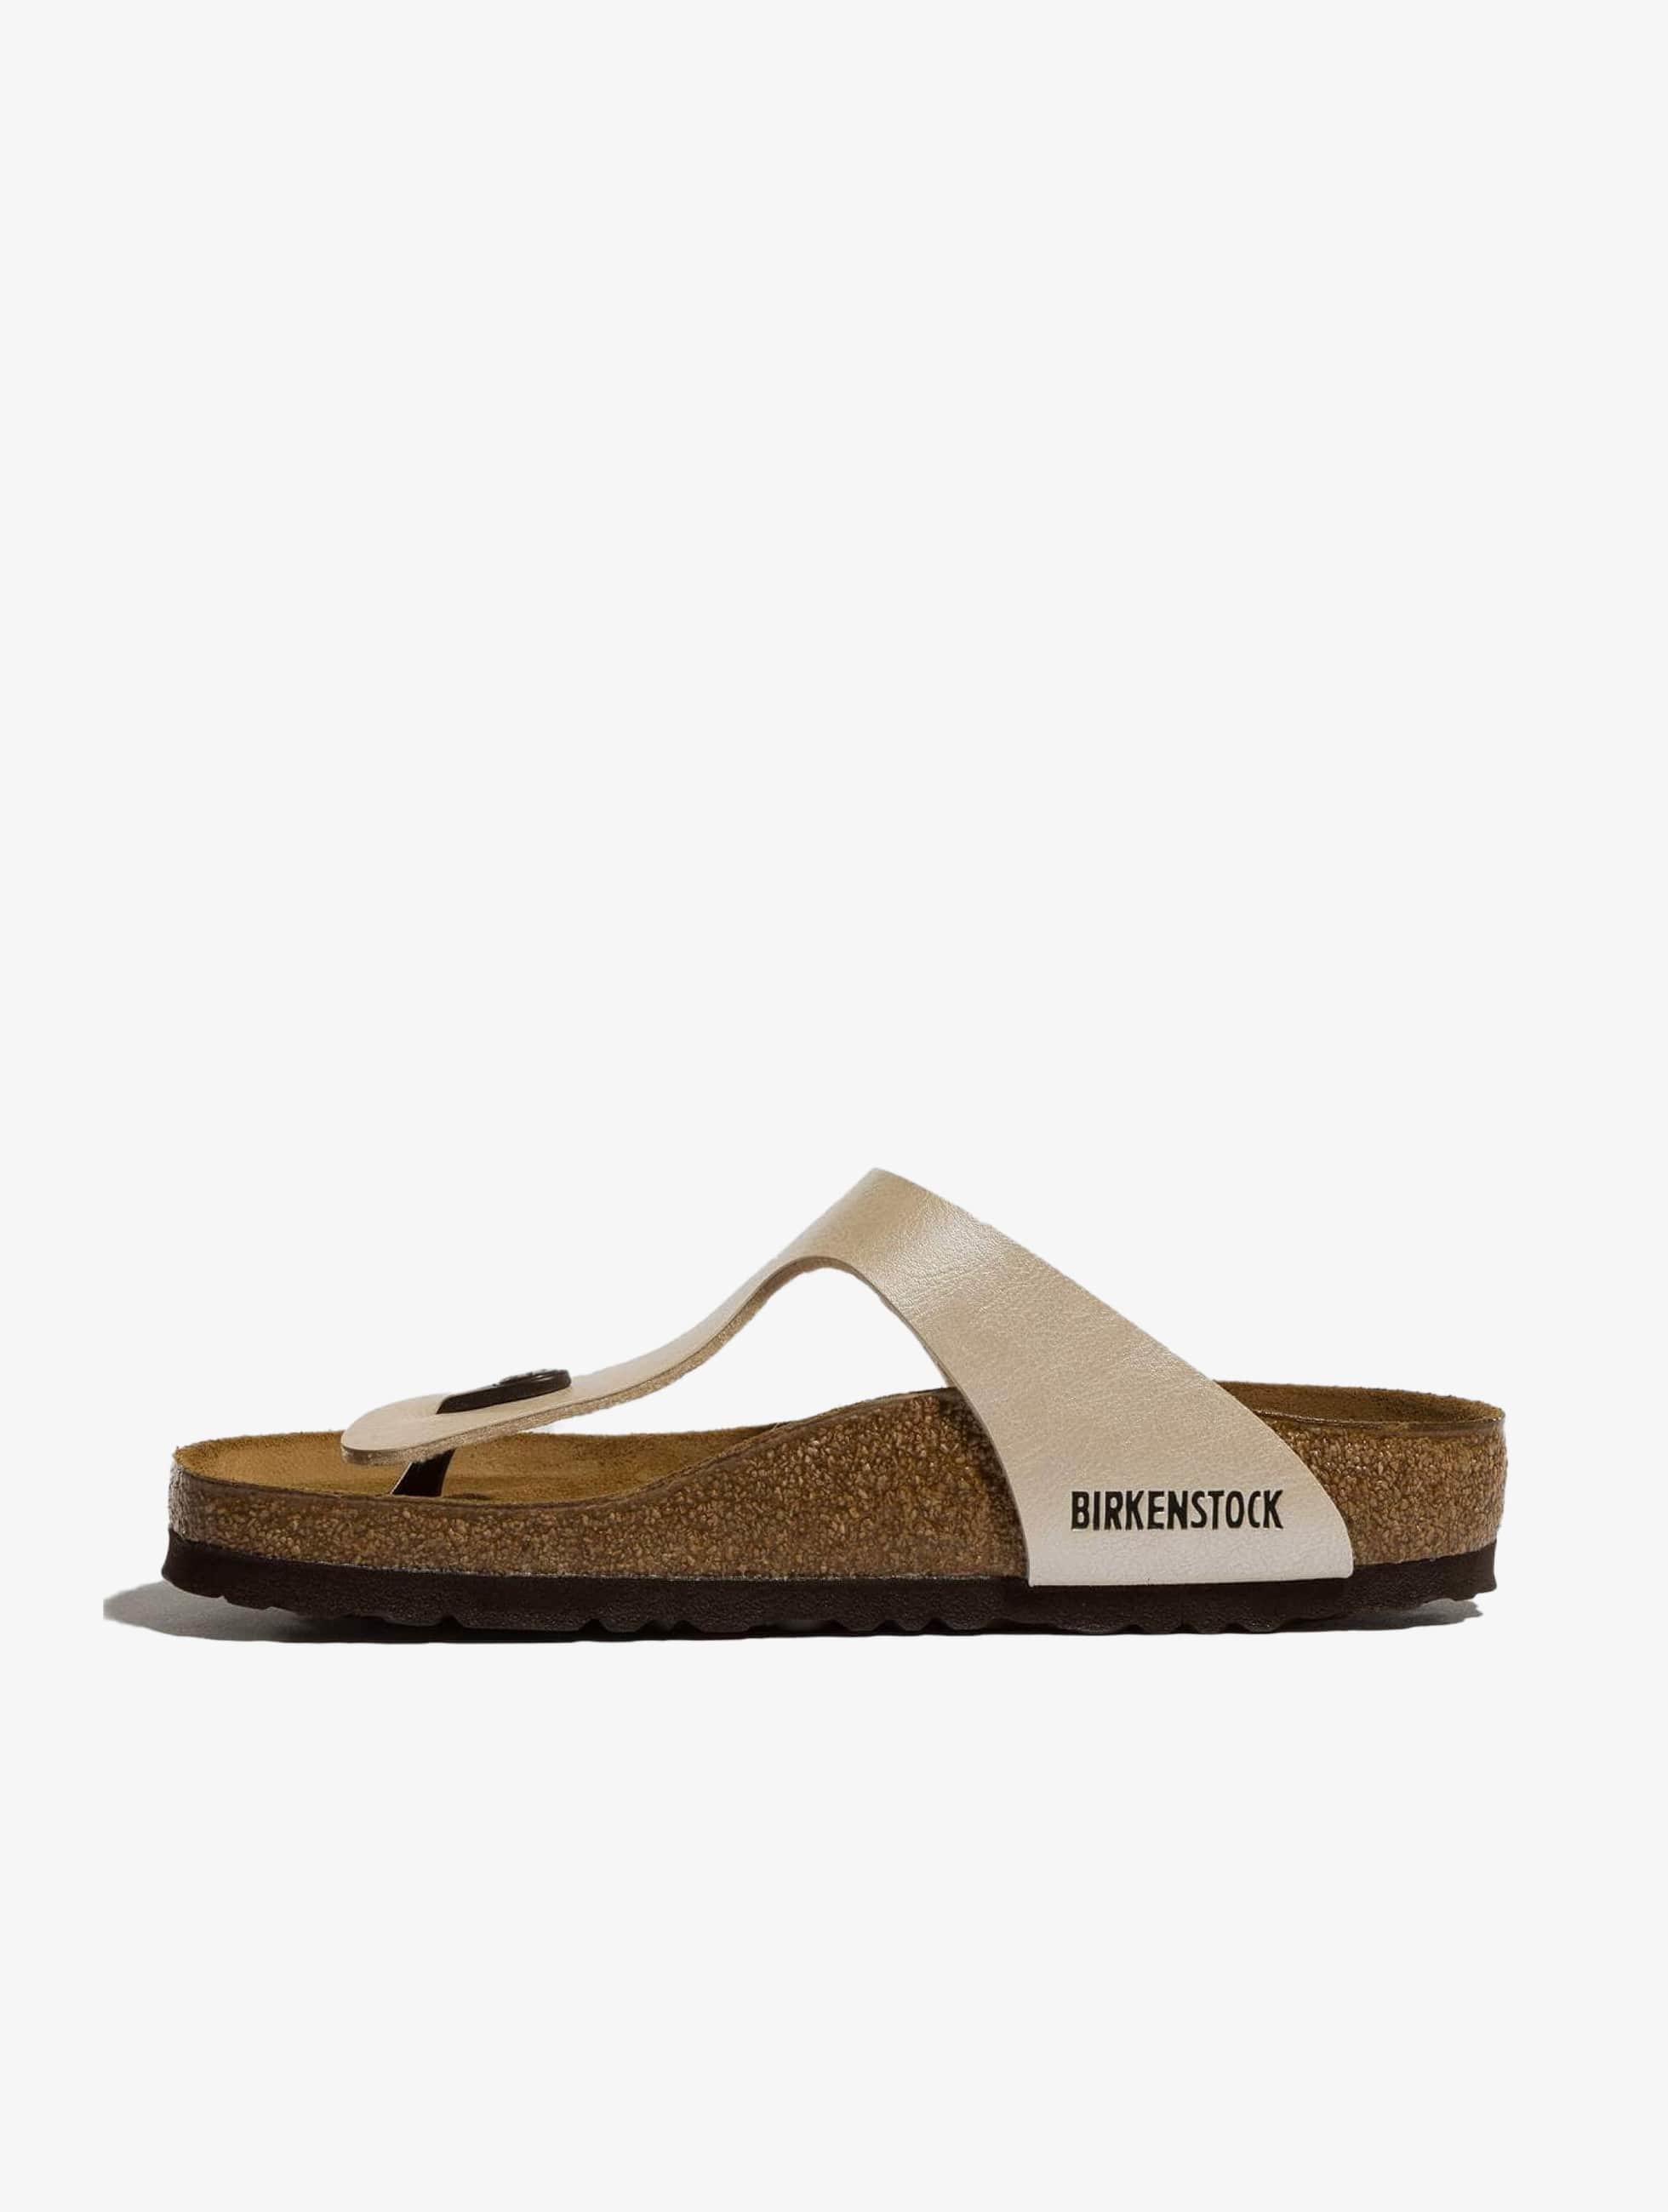 Birkenstock Gizeh BF Graceful Sandals Pearl White